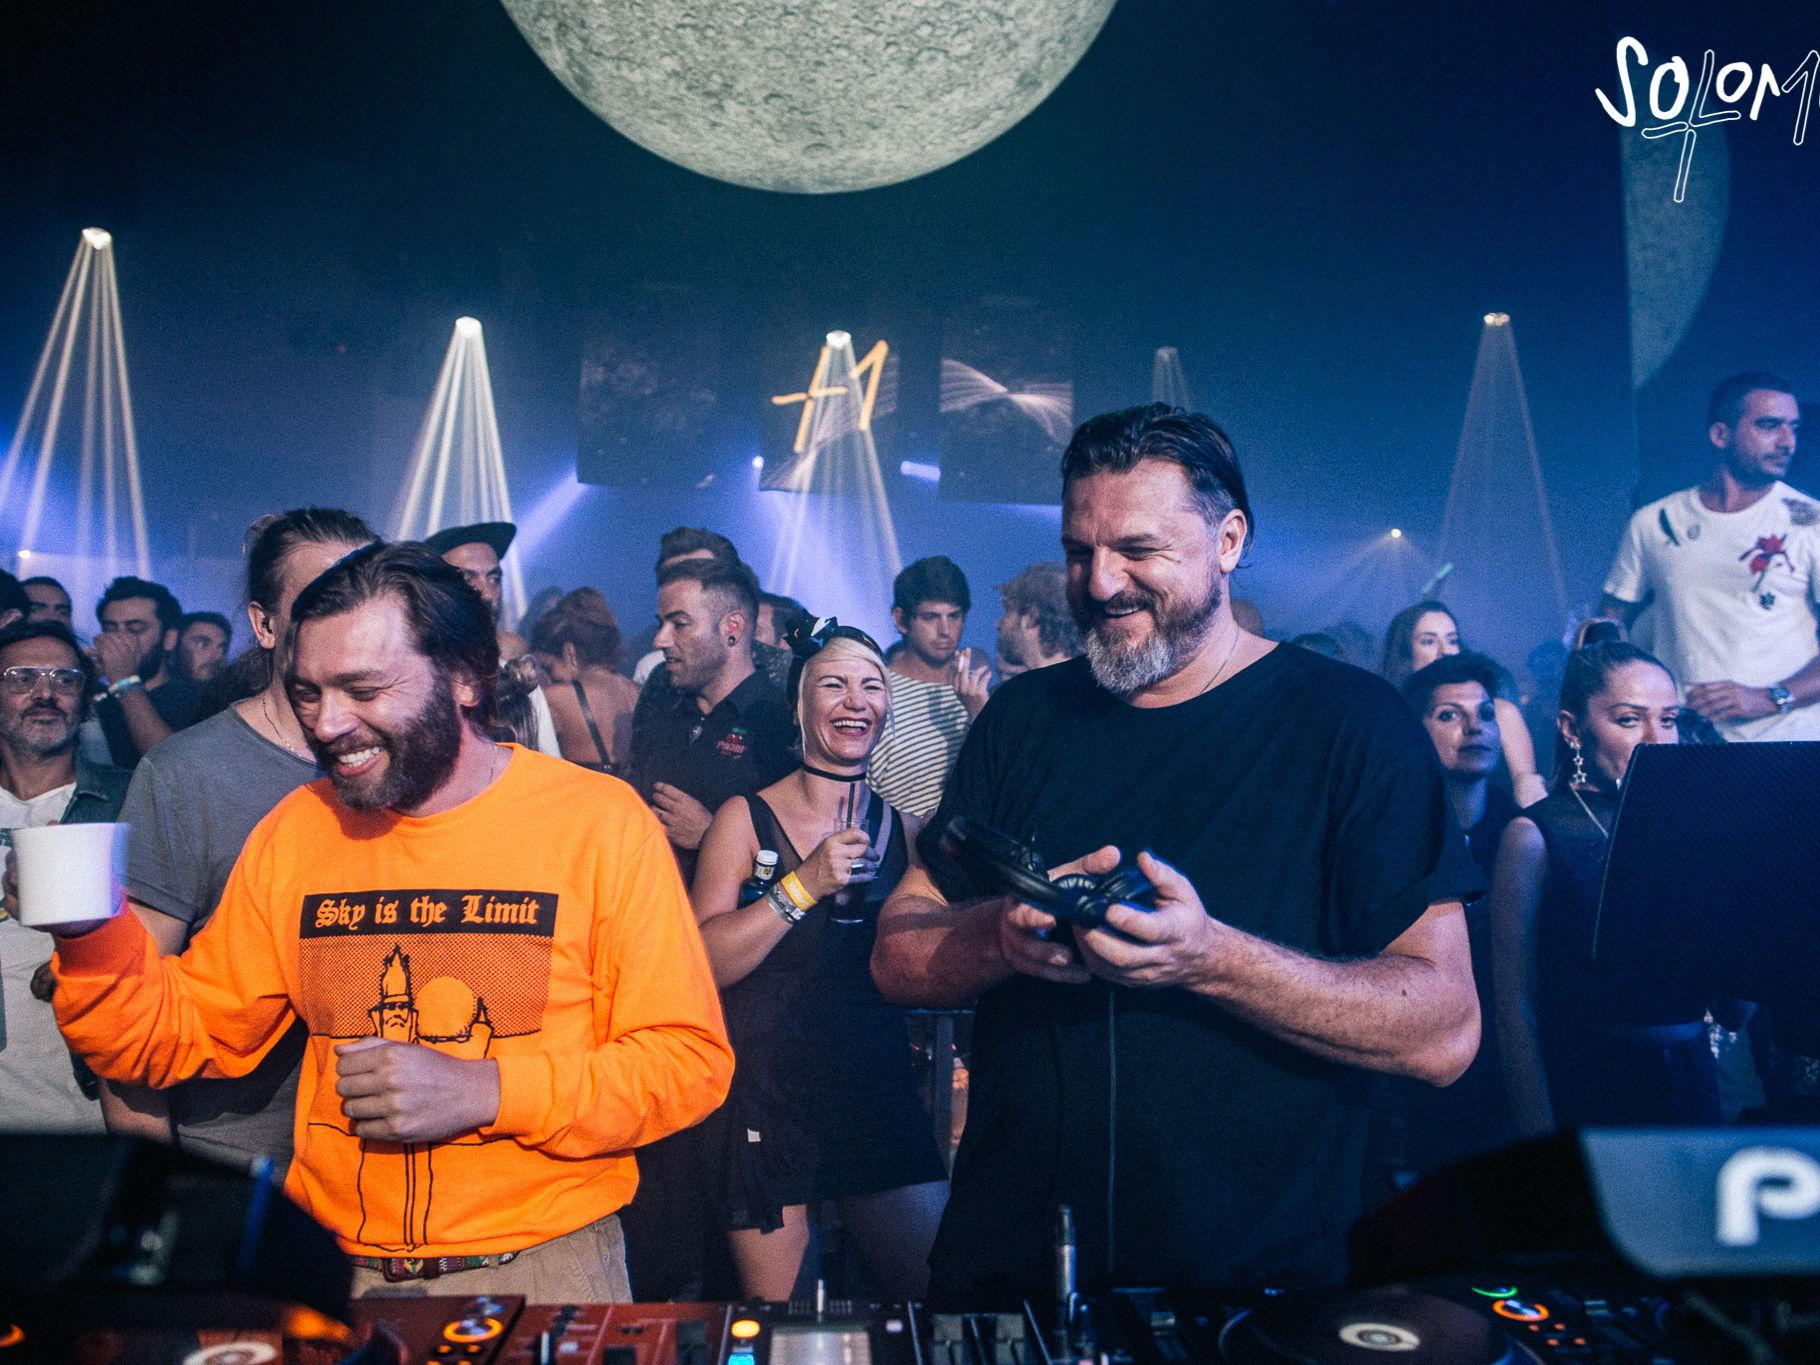 Gerd Janson special guest Solomun +1 Pacha Ibiza